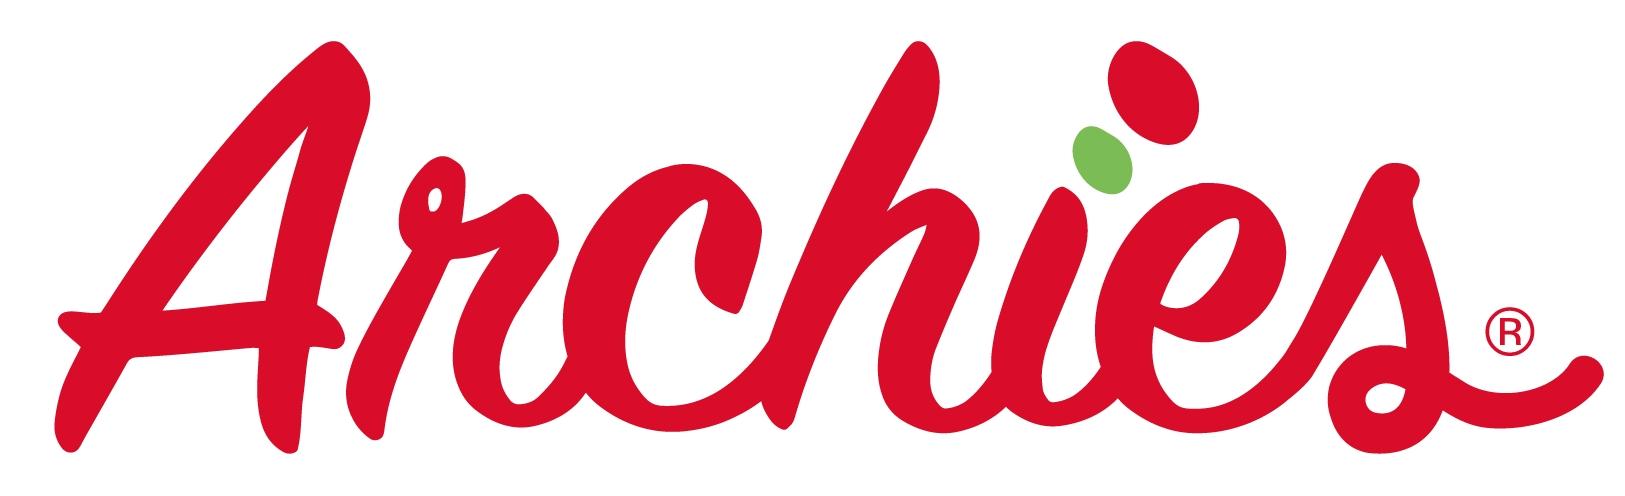 Archies Tesoro